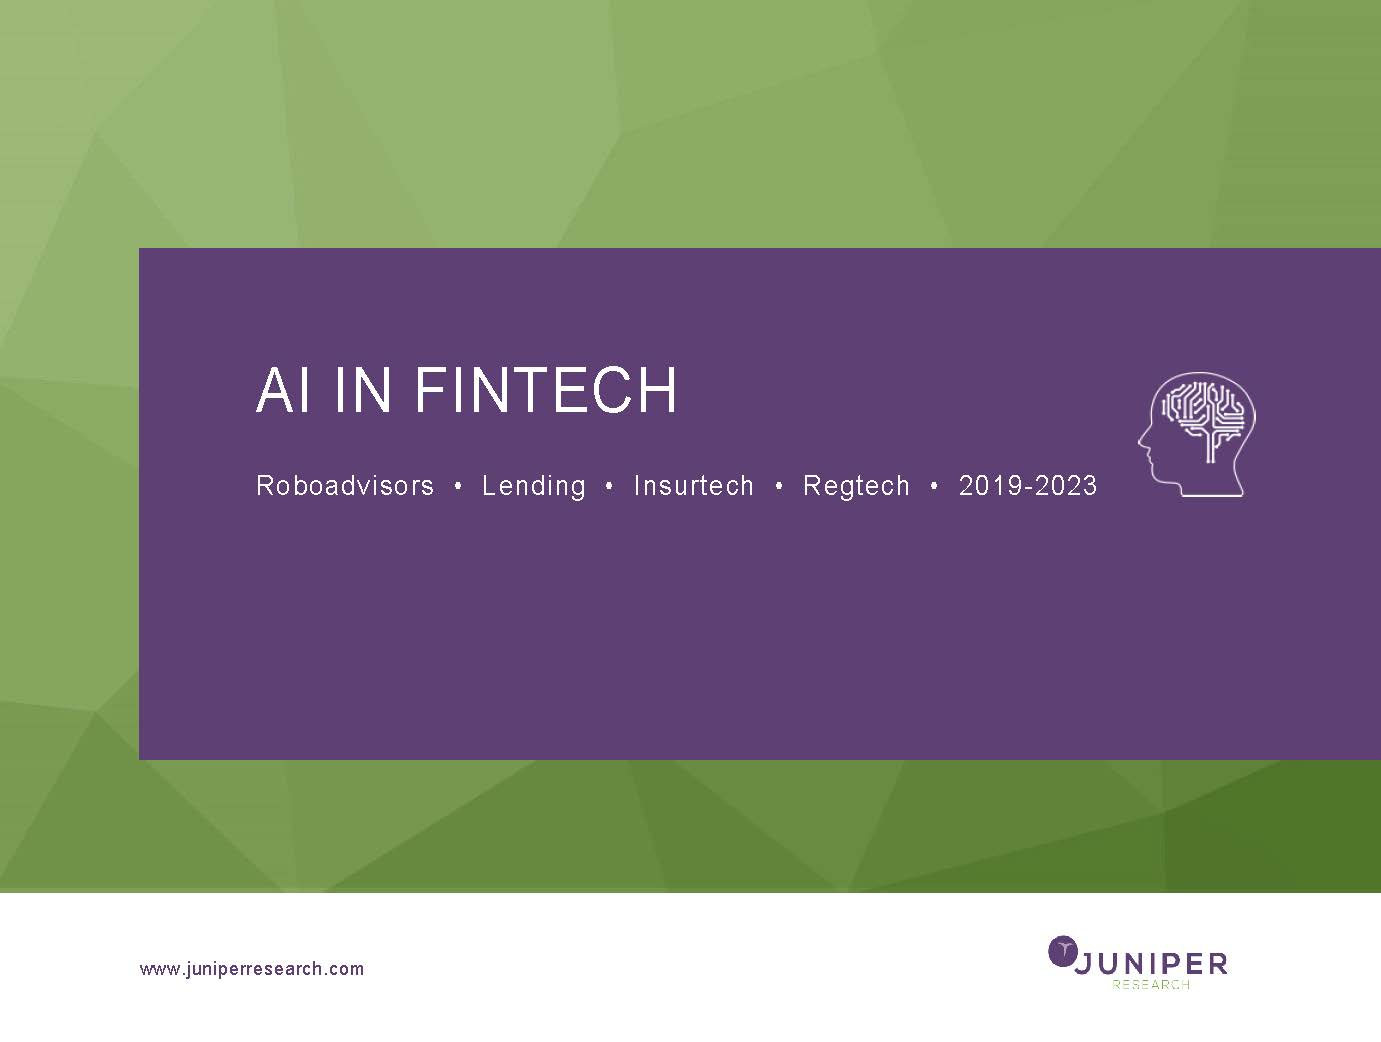 AI in Fintech Research Report | Fintech & Payments